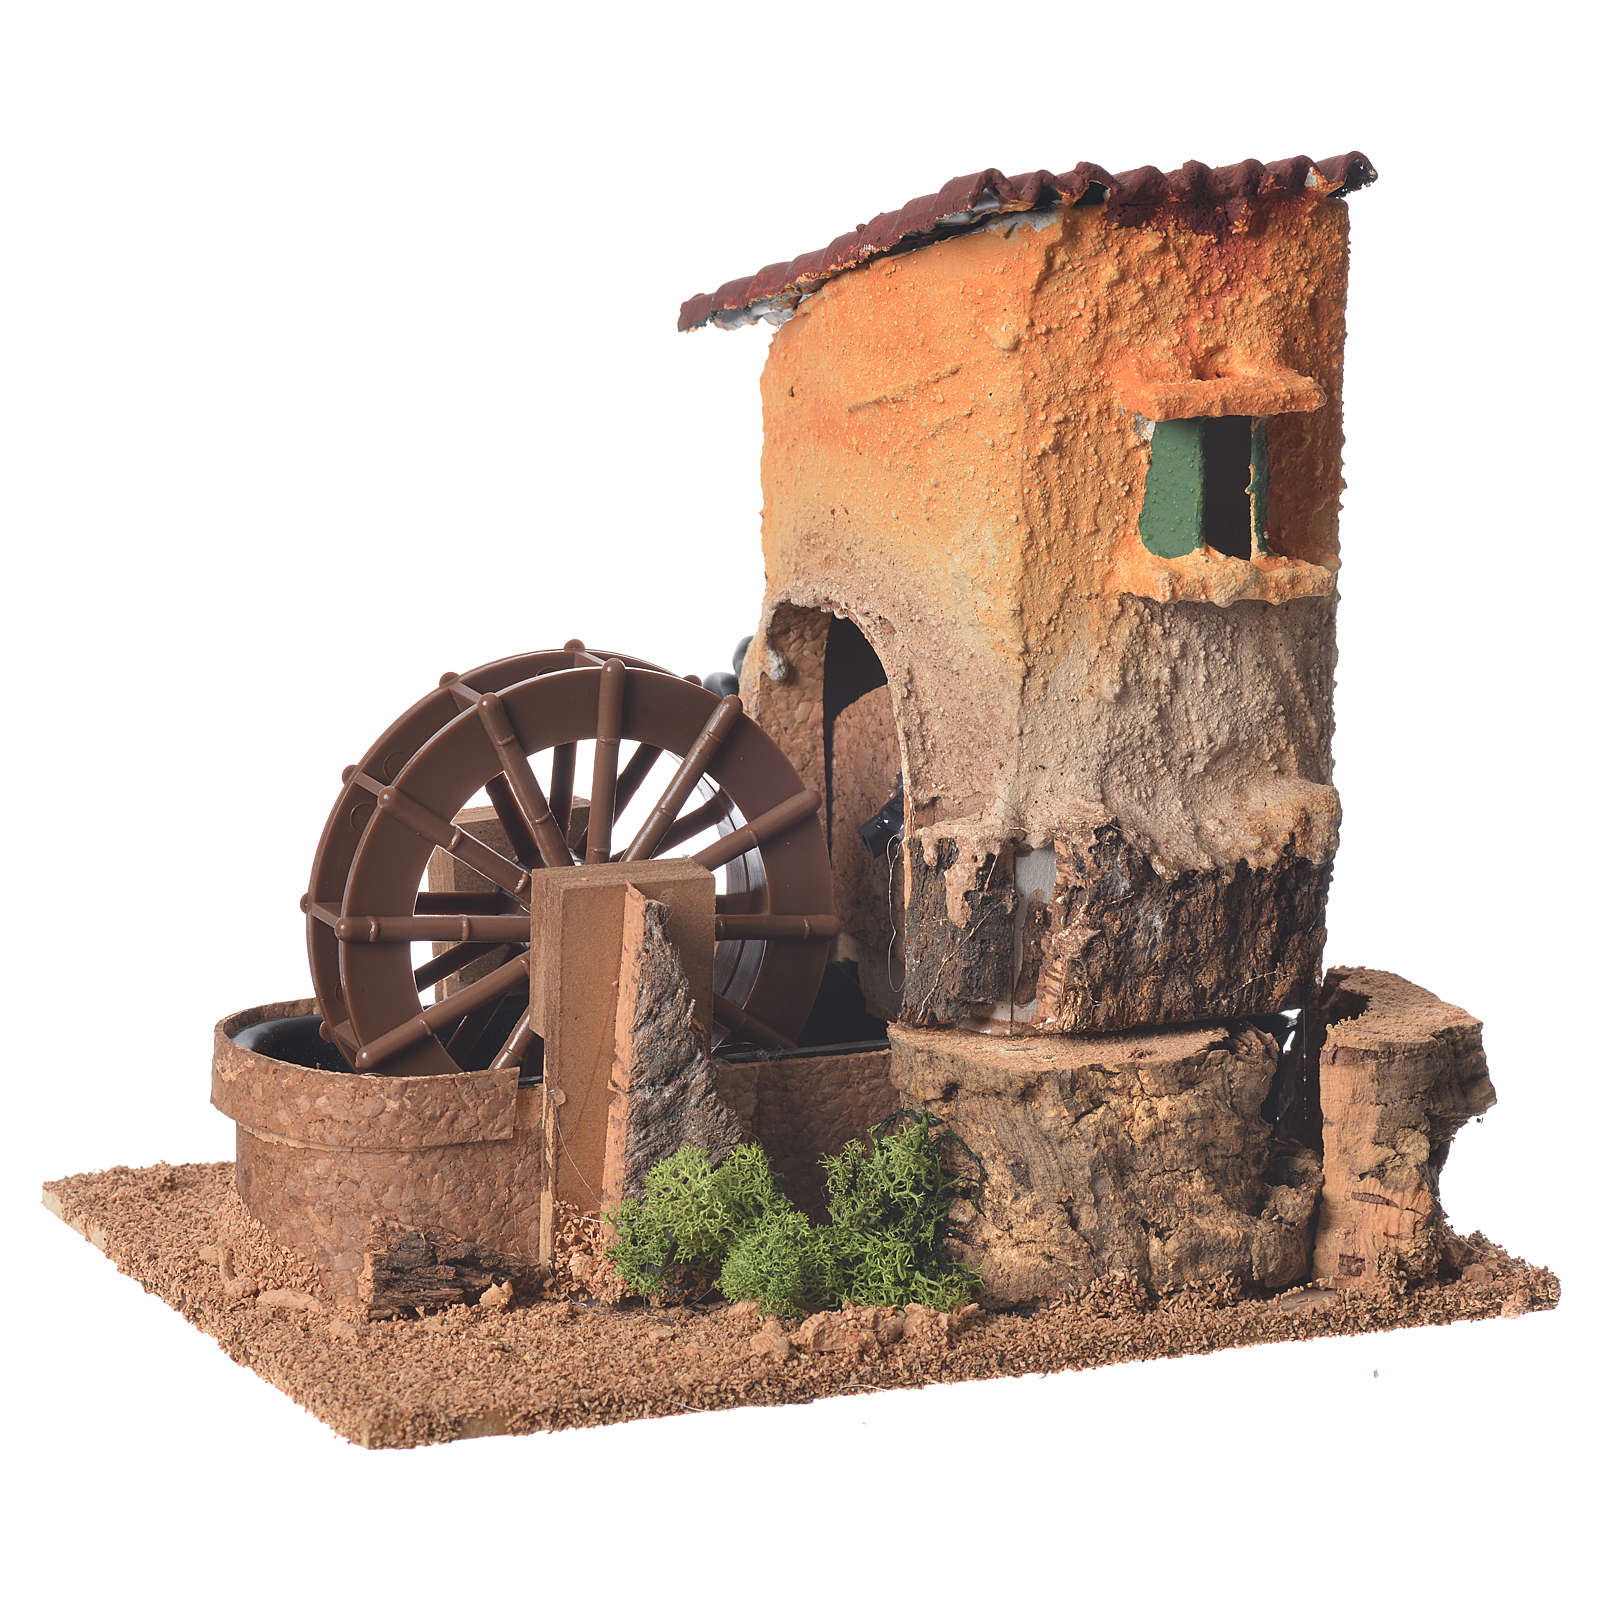 Viejo molino de agua belén 20x15x20 cm 4